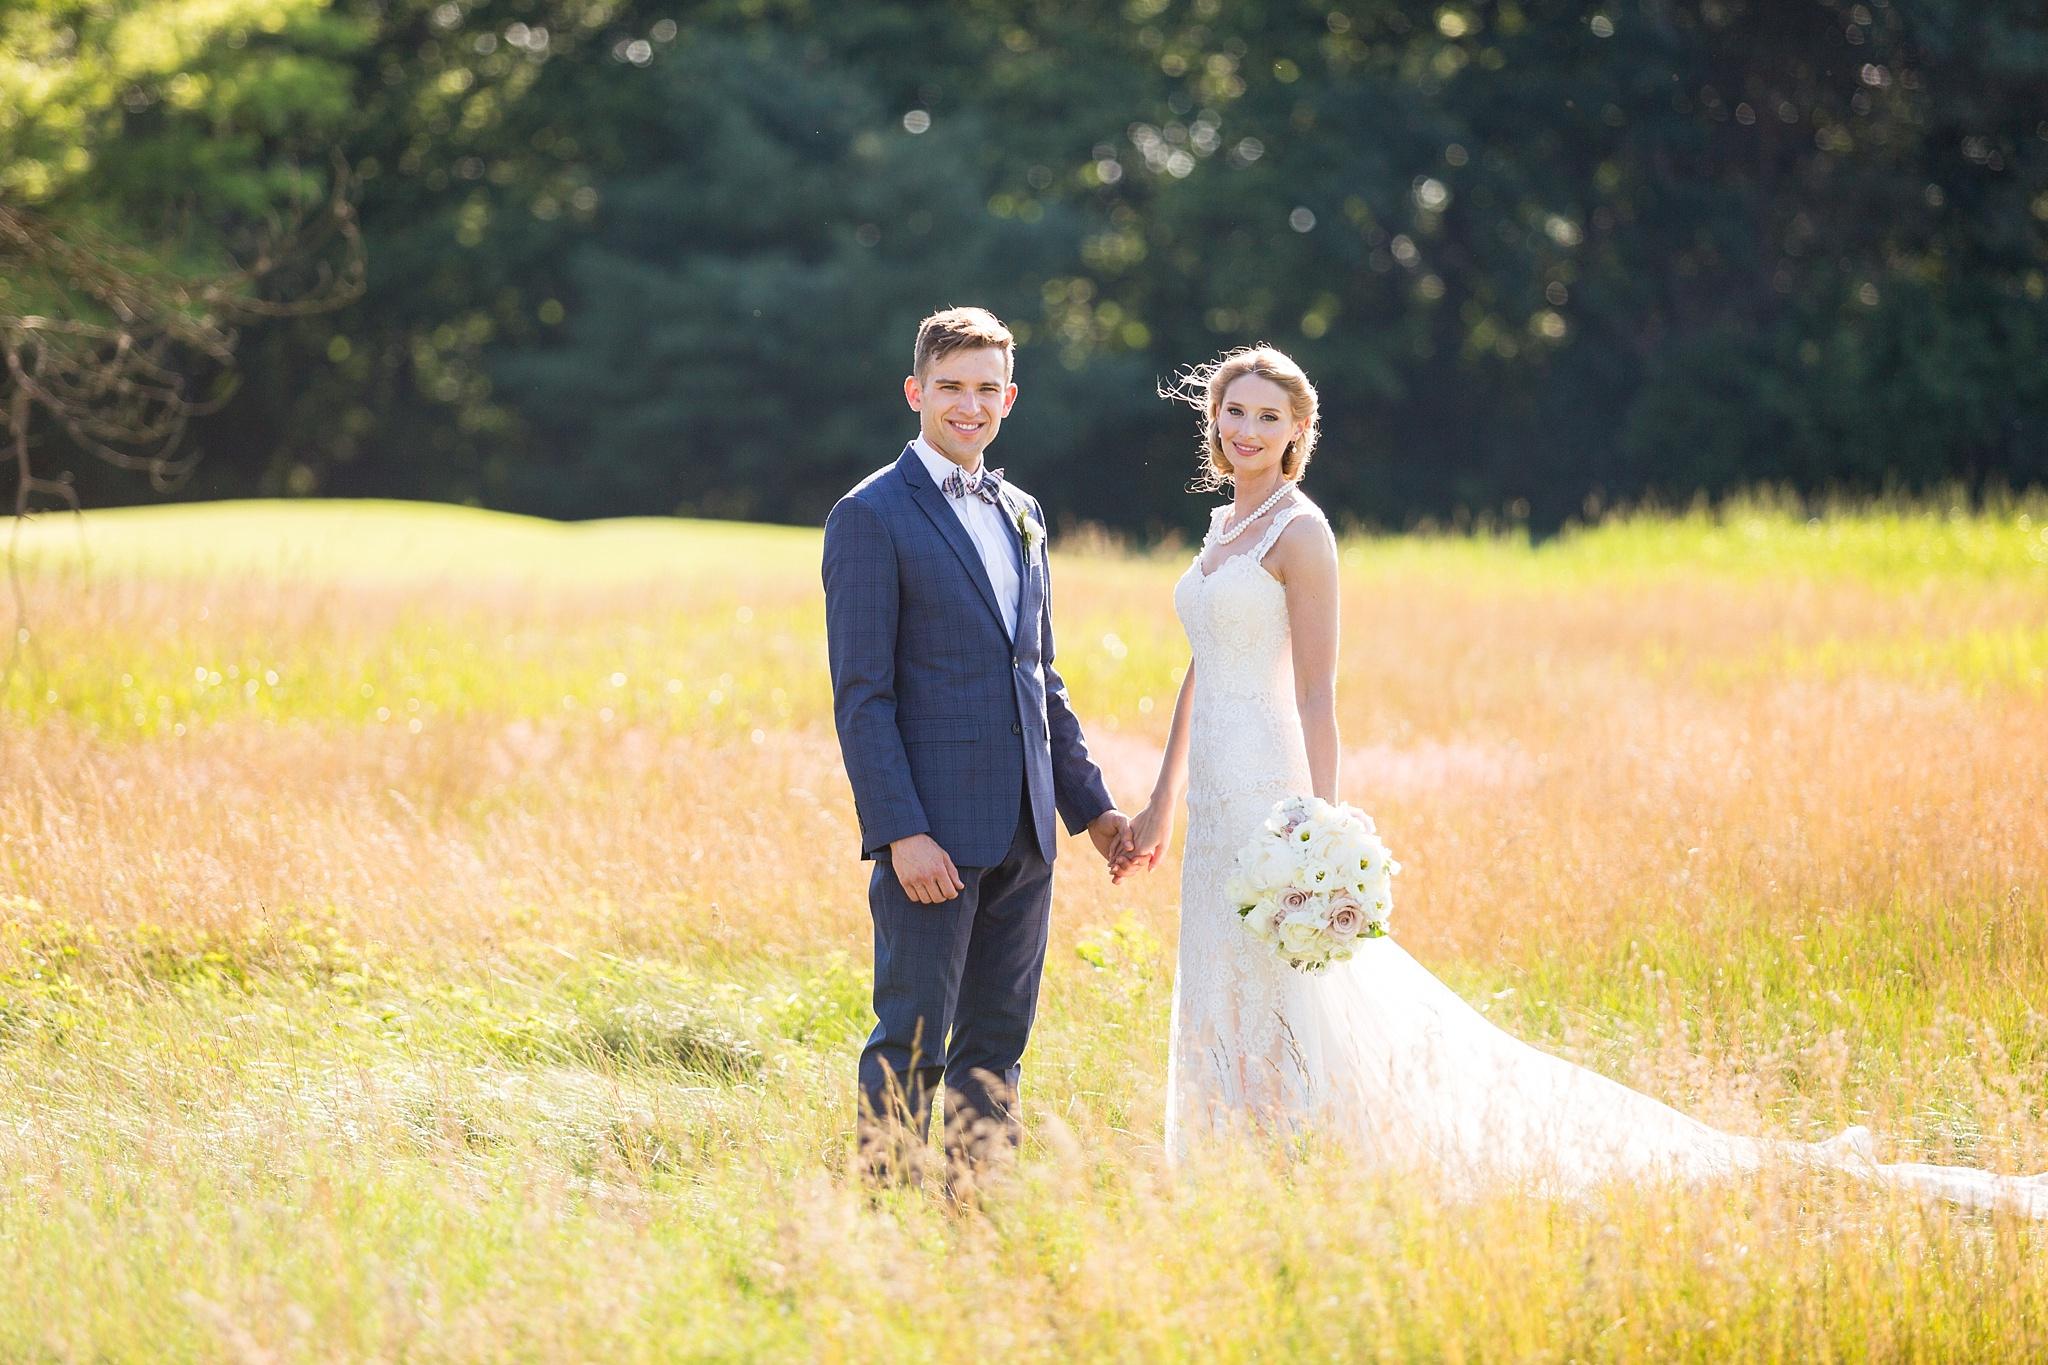 Becky_Cameron_Grand_Rapids_Blythefield Country_Club_Wedding050.JPG